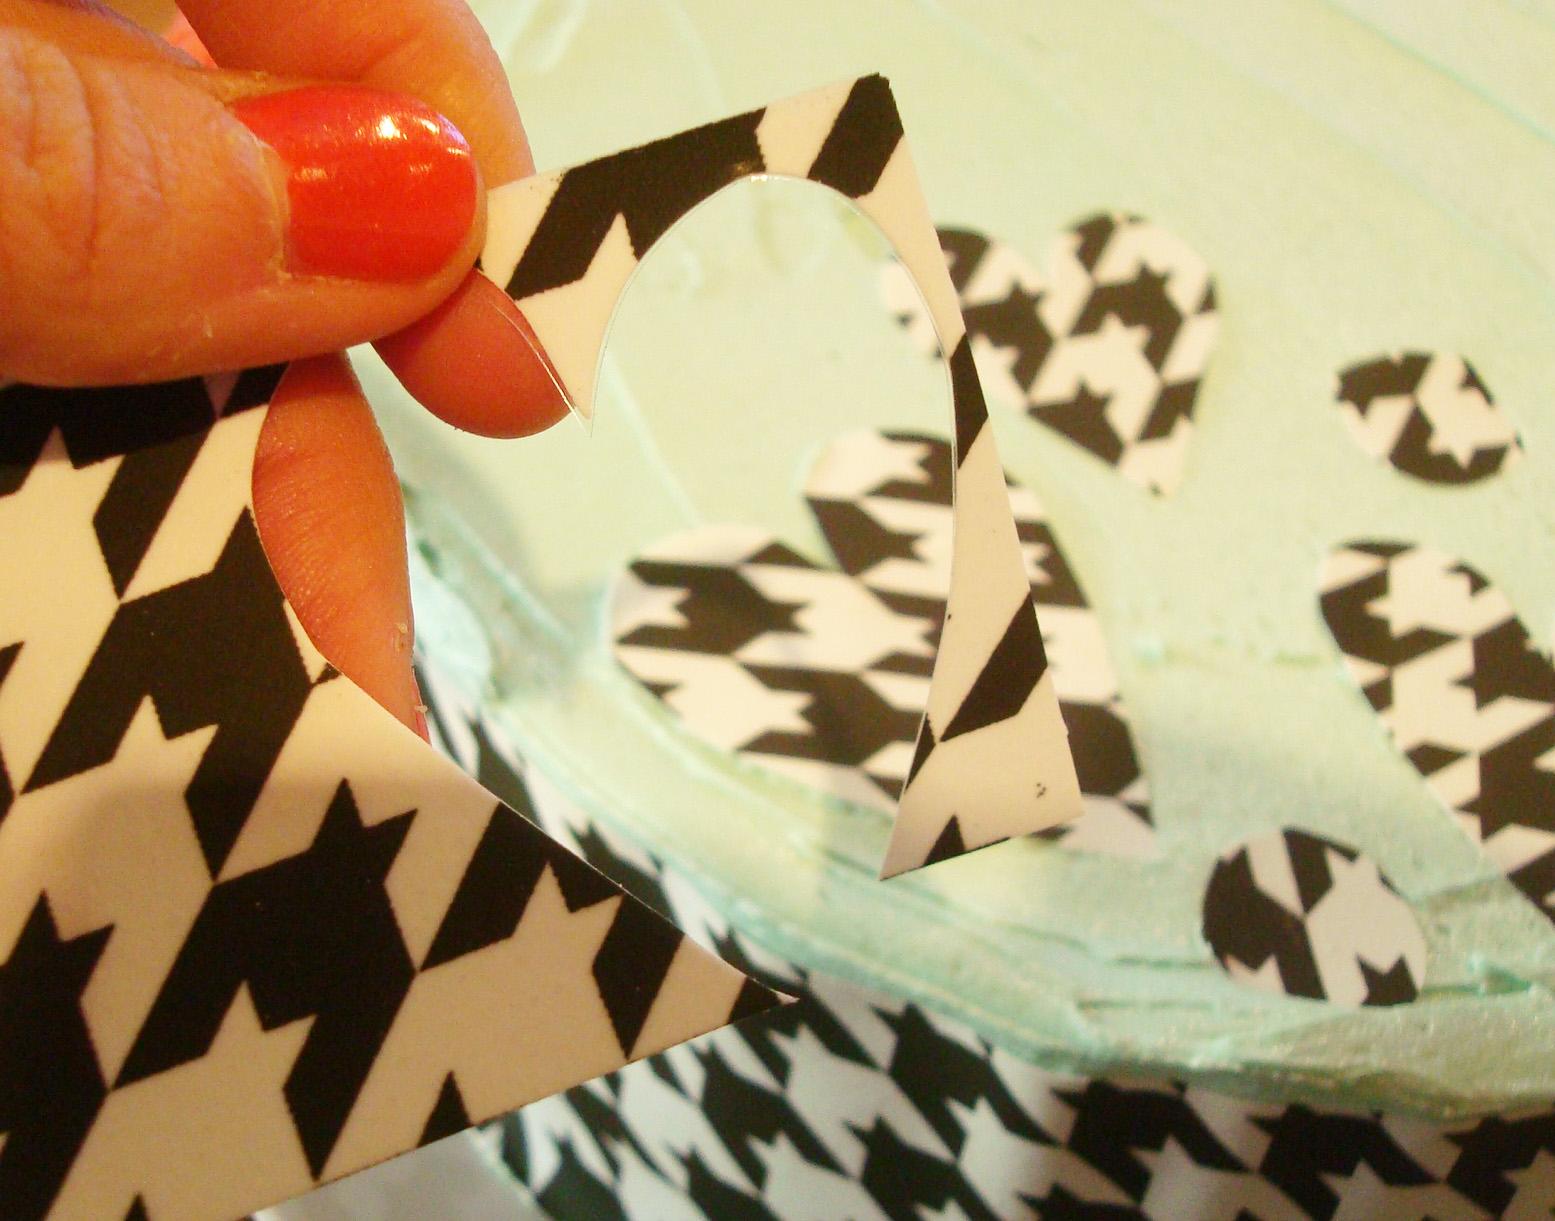 Cutting Shapes from Sugar Sheet